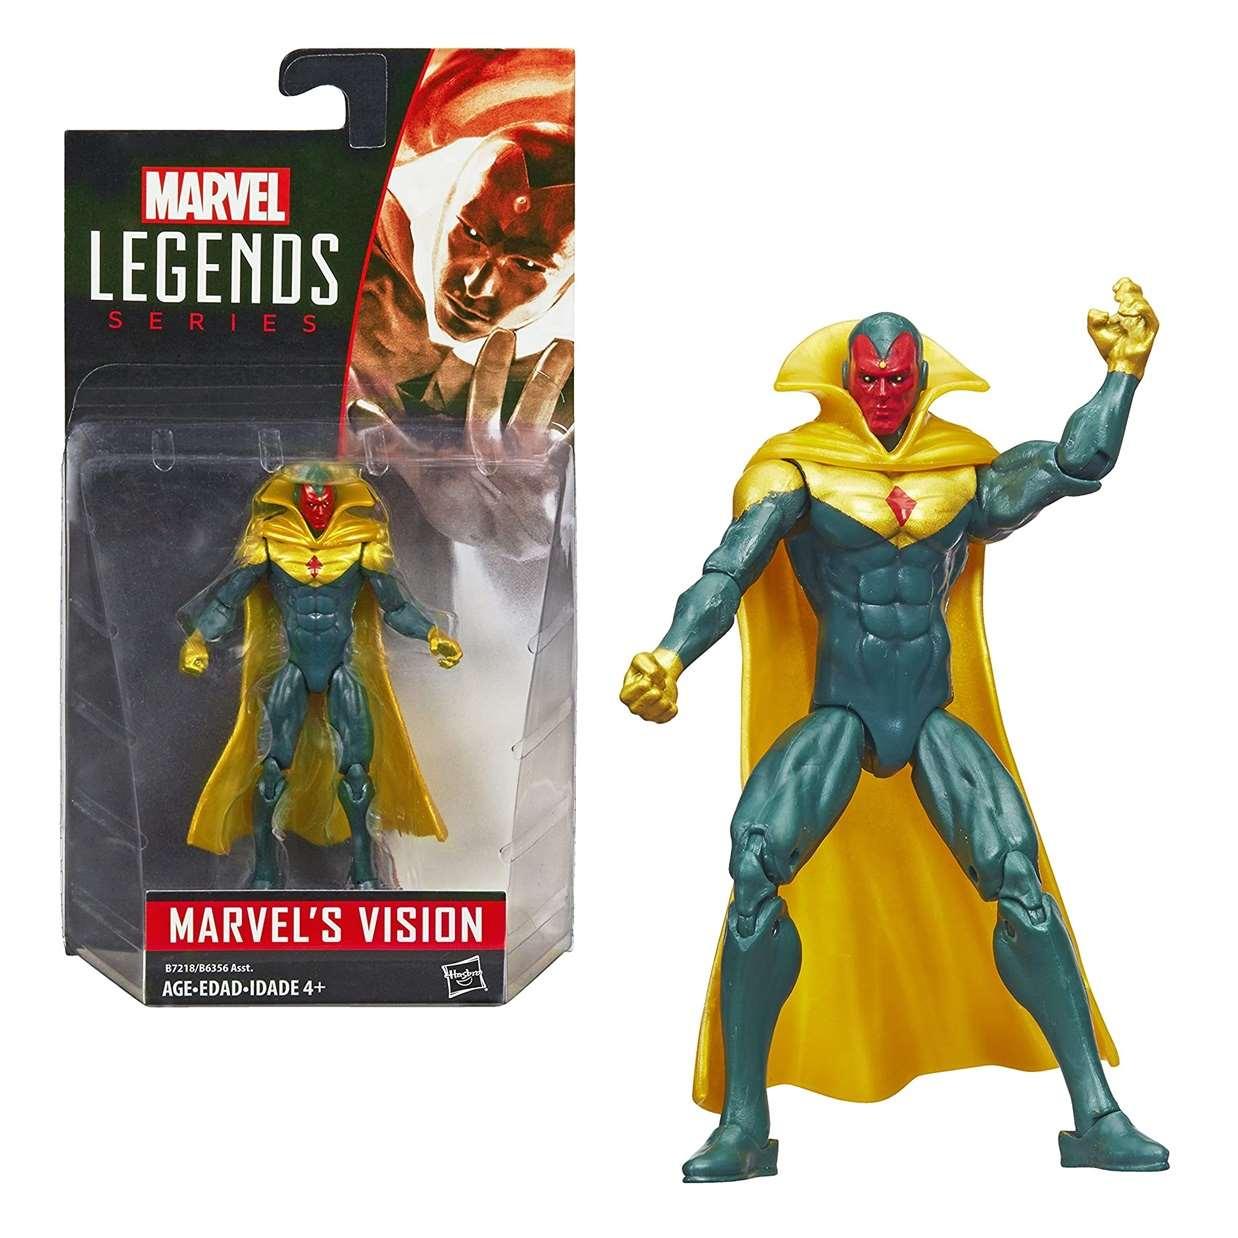 Visión Figura Marvel Legends 3.75 Pulgadas Hasbro